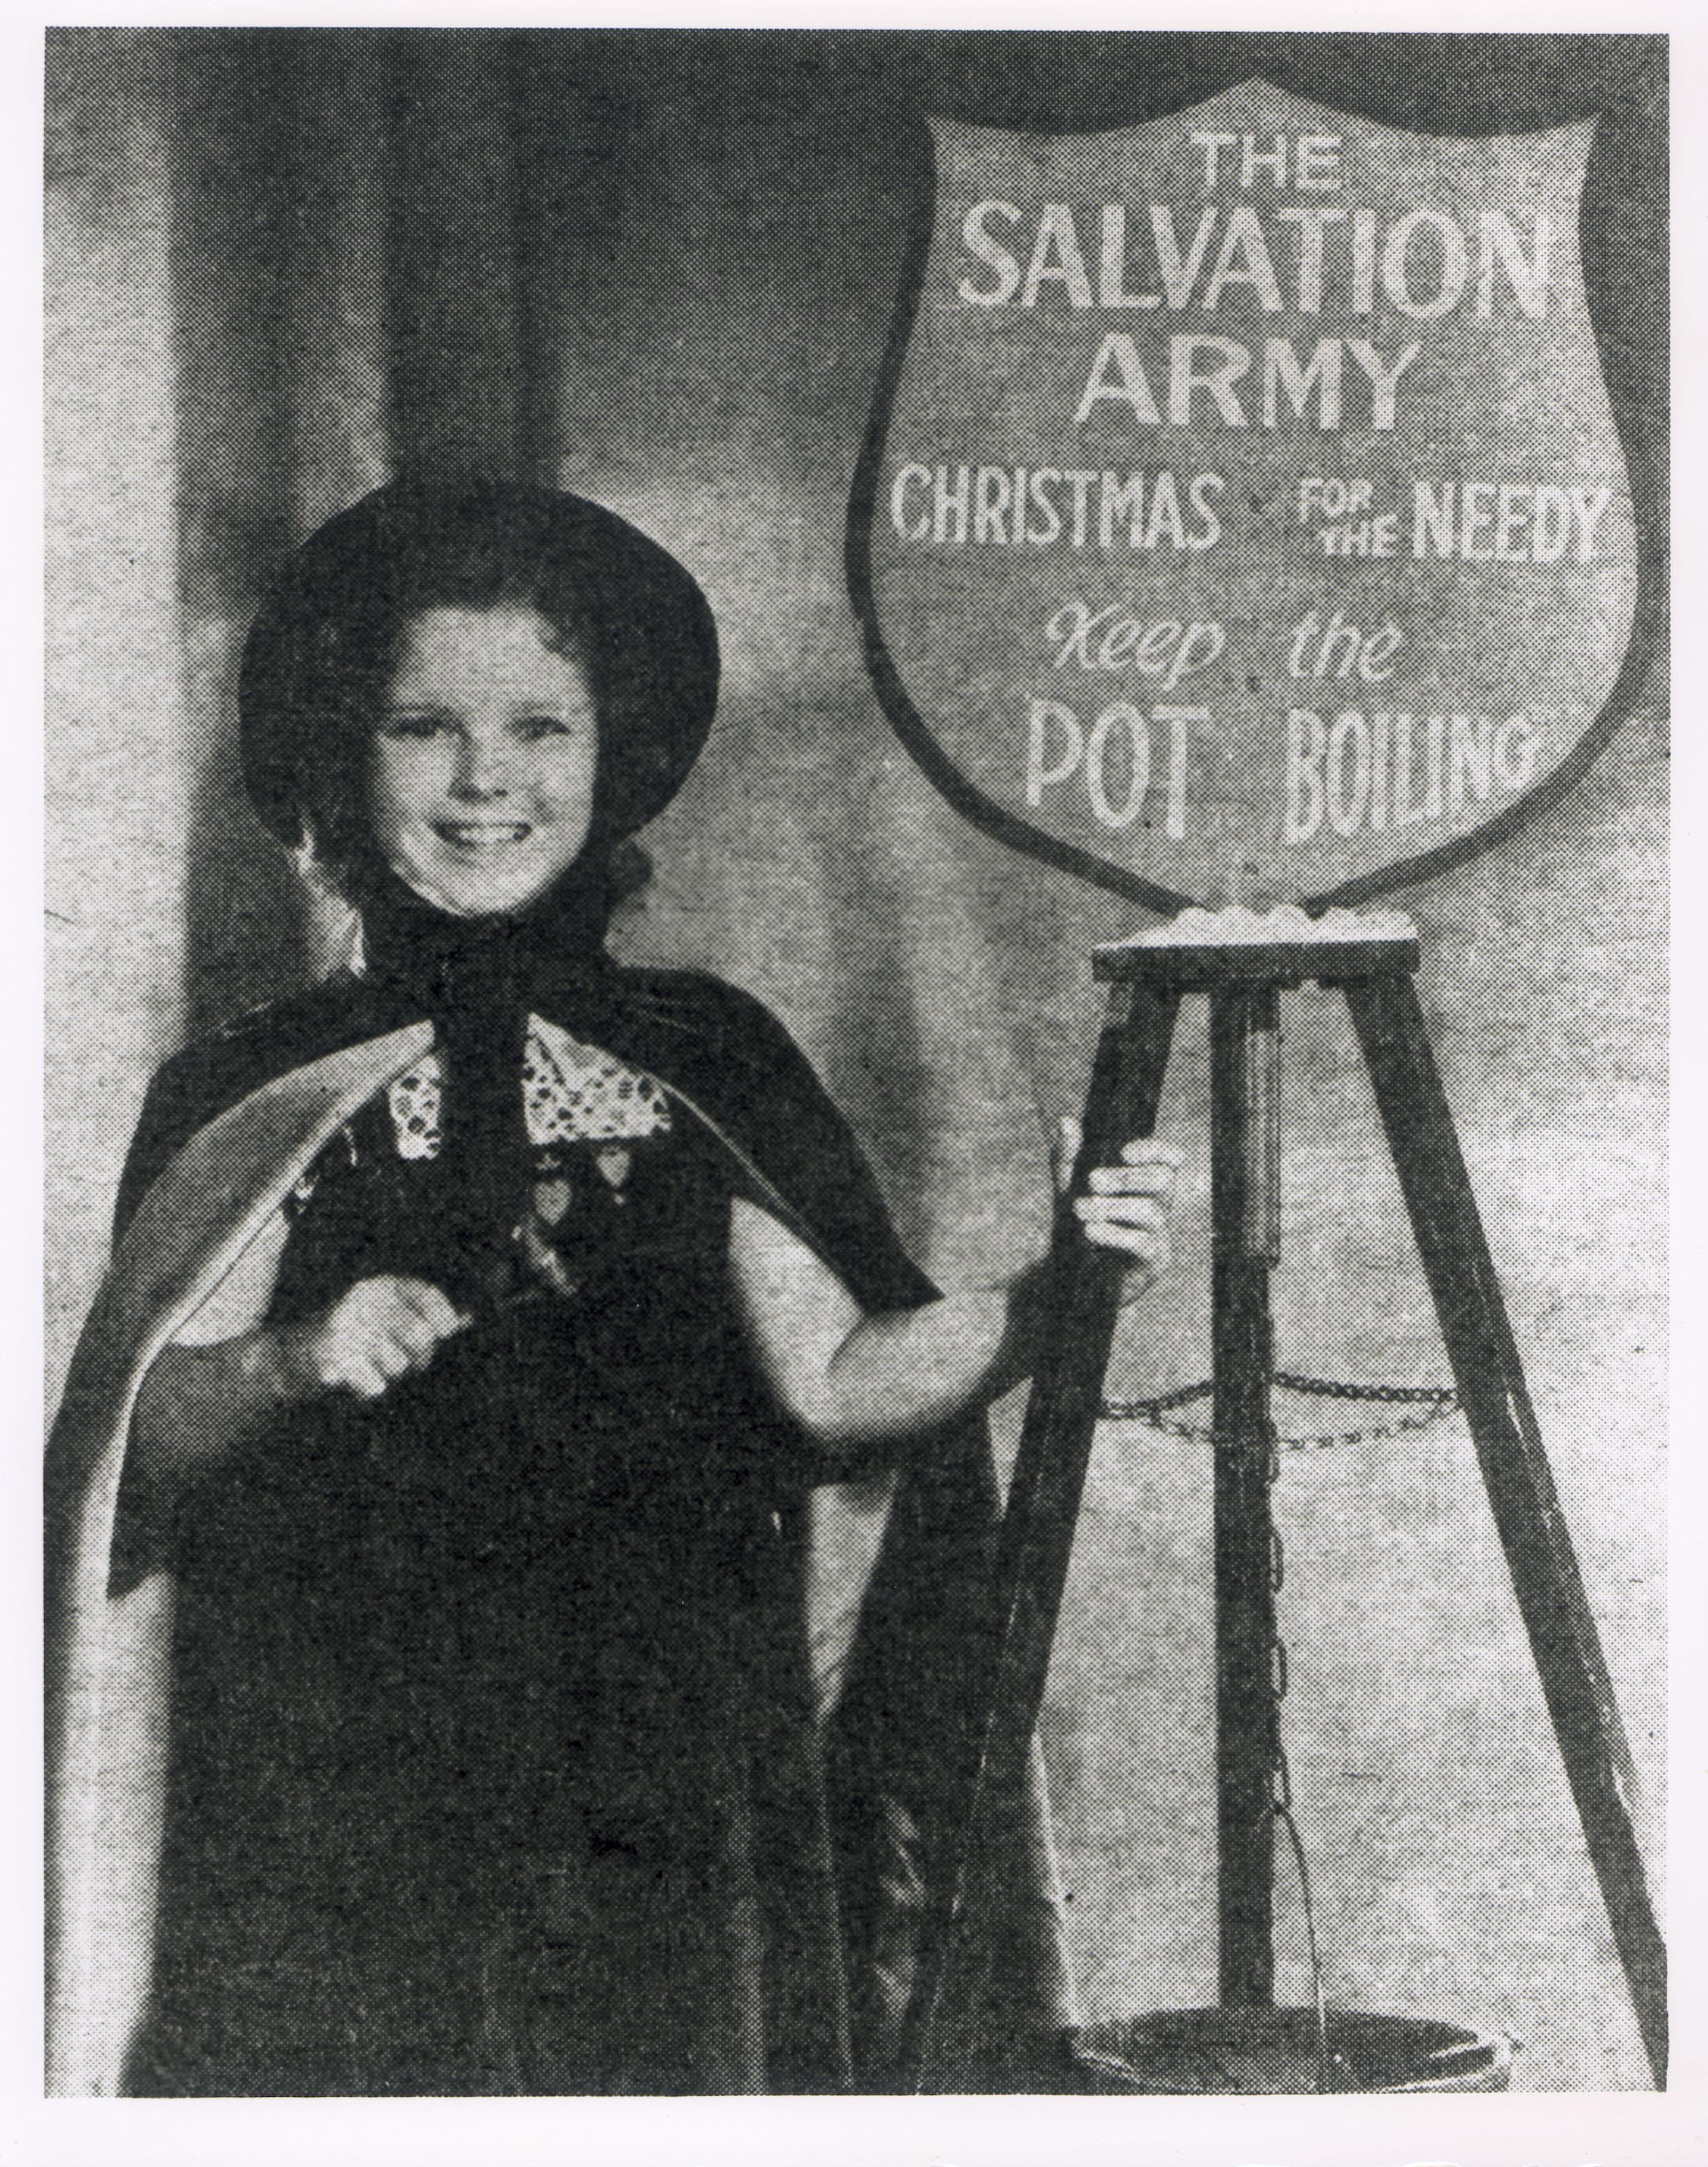 Southern California Home Salvation Army Army Christmas Army